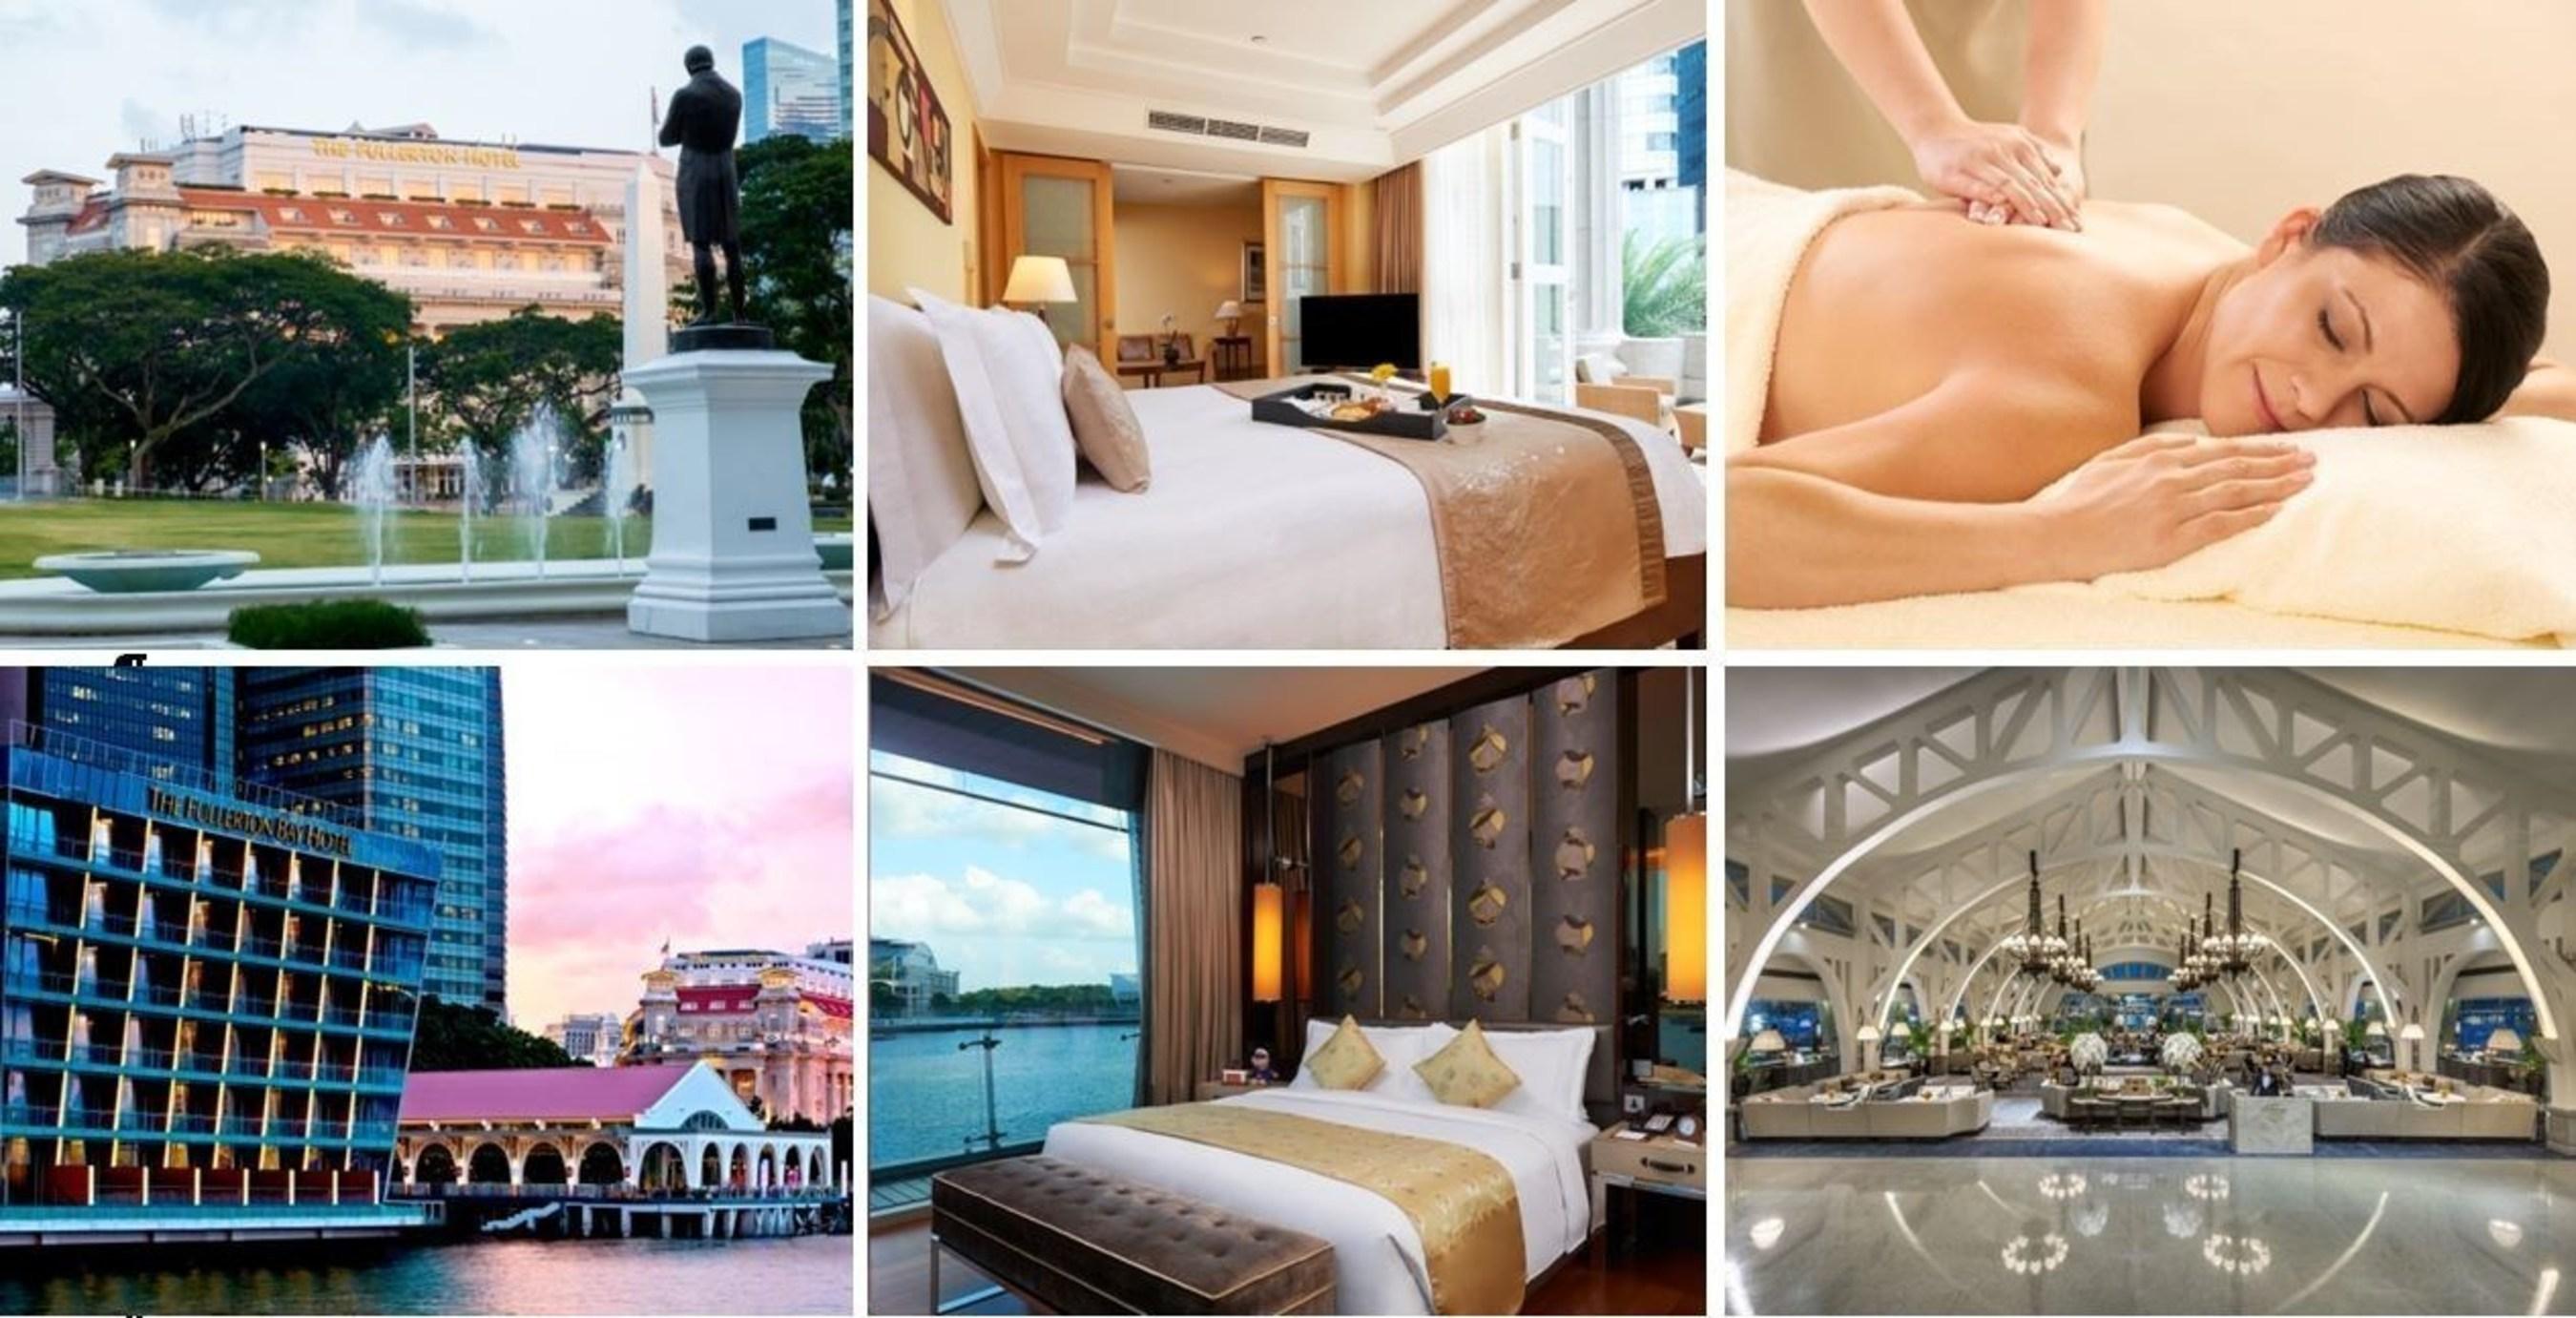 The Fullerton Hotels Launches New Global Website: www.fullertonhotels.com